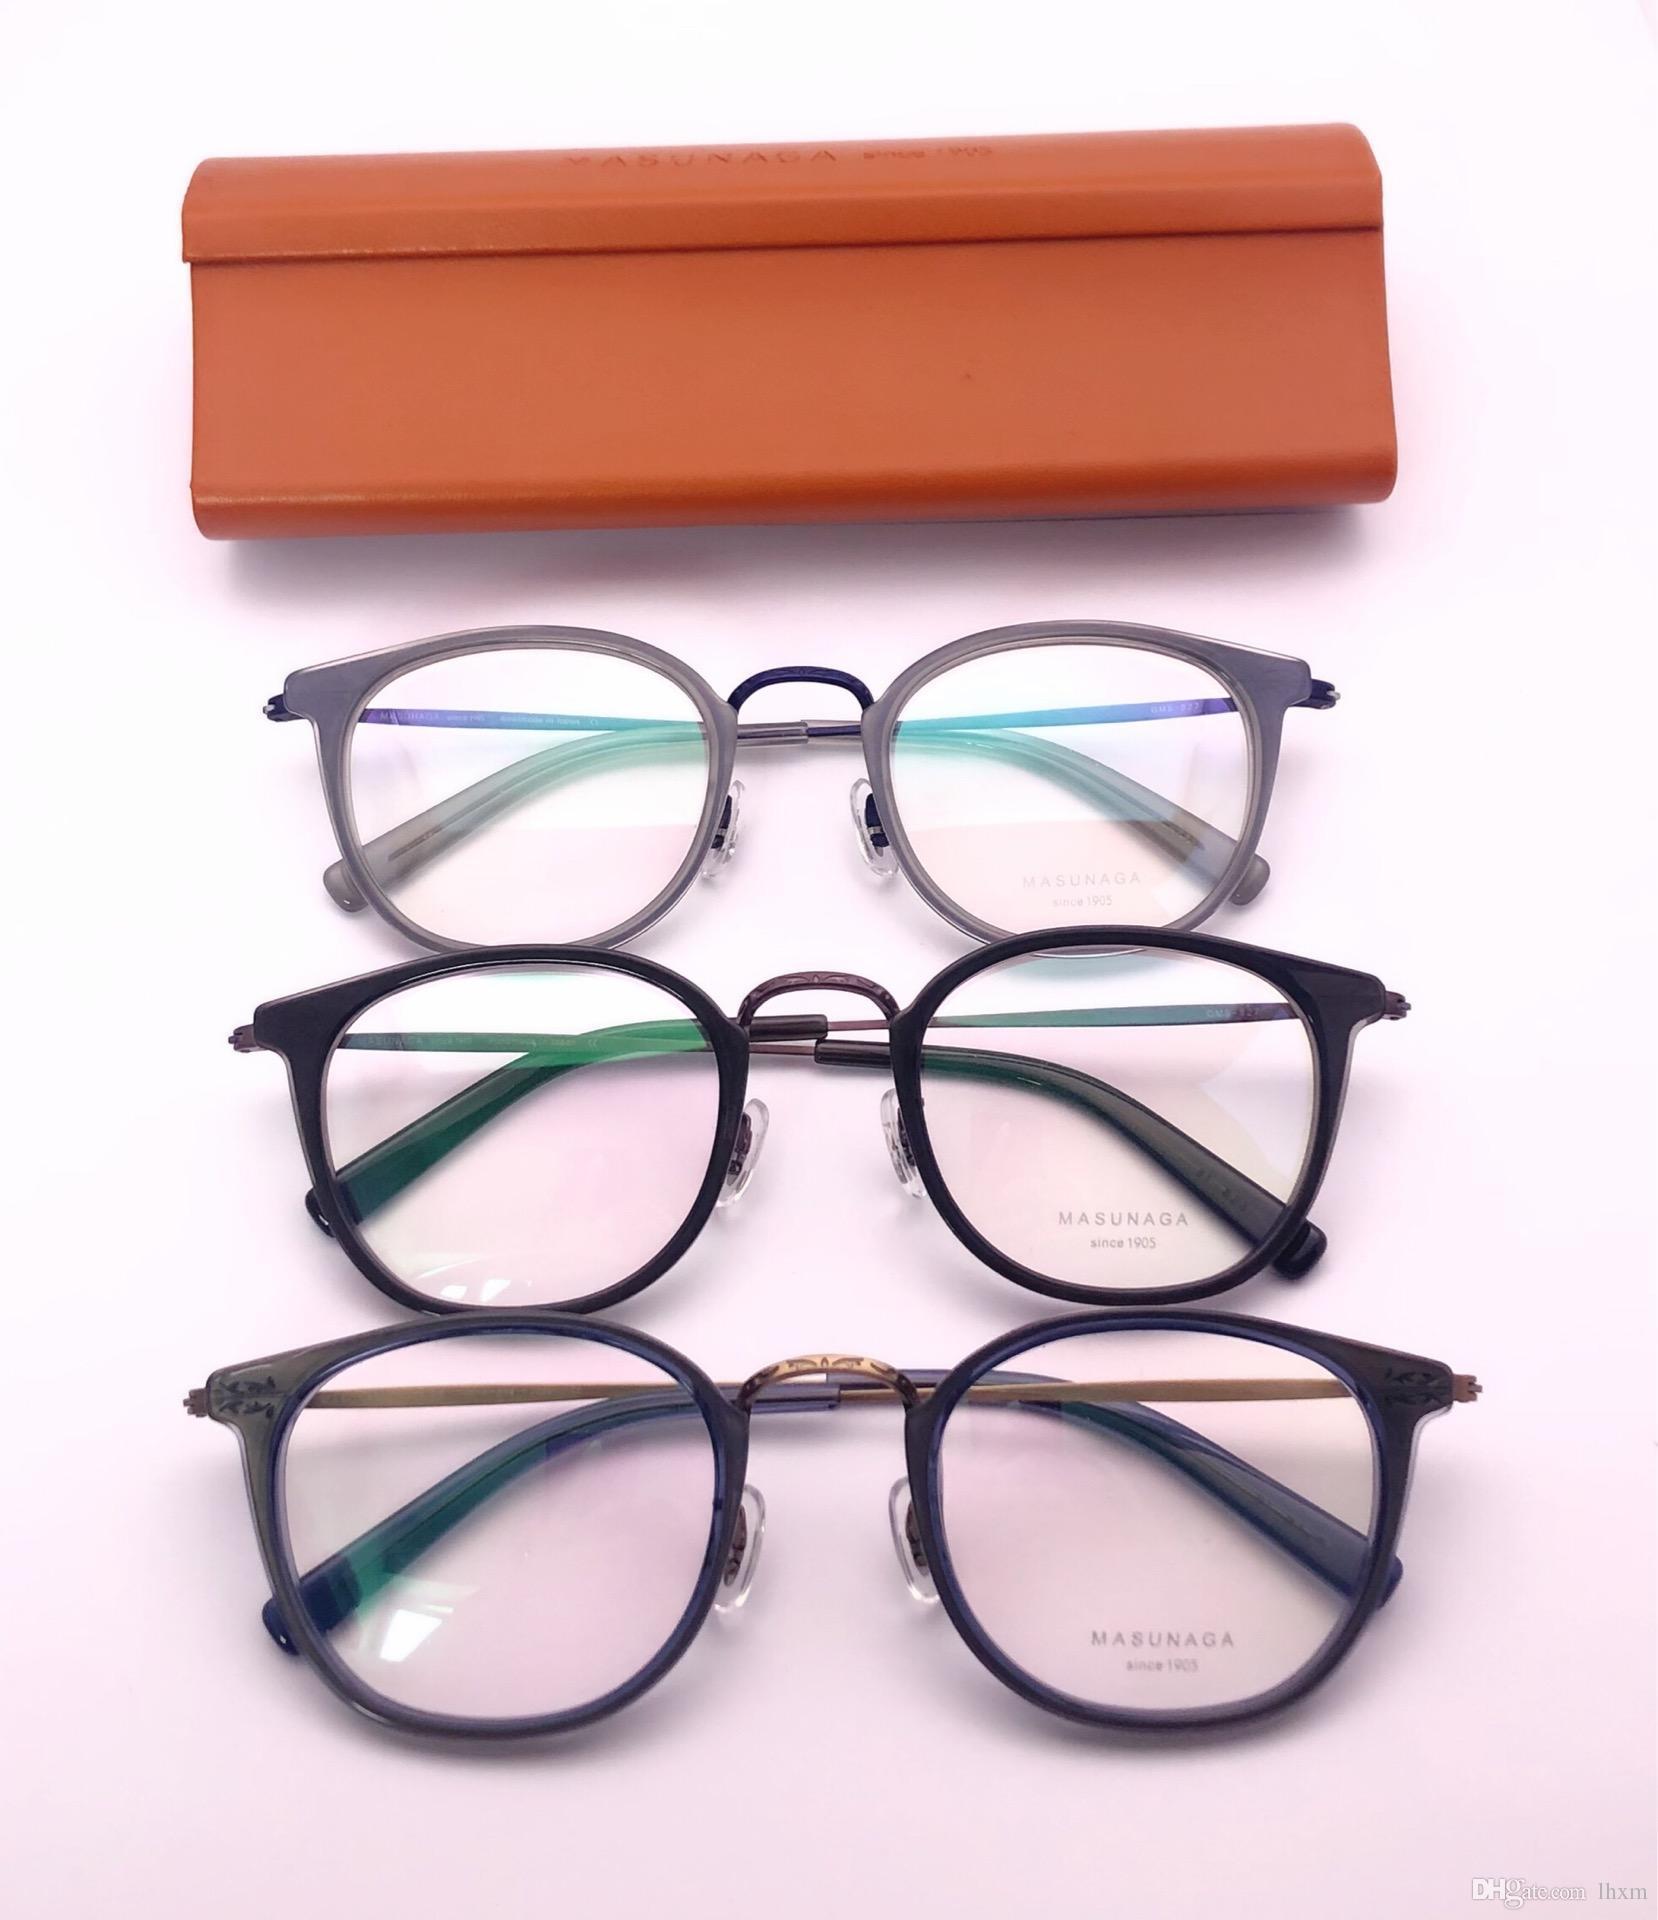 3bd750c77c 2019 Brand Design 2018 New GMS 827 Men S Eyeglass Frame Fashion Round Eyeglass  Frame Size 48 22 145 From Willielin